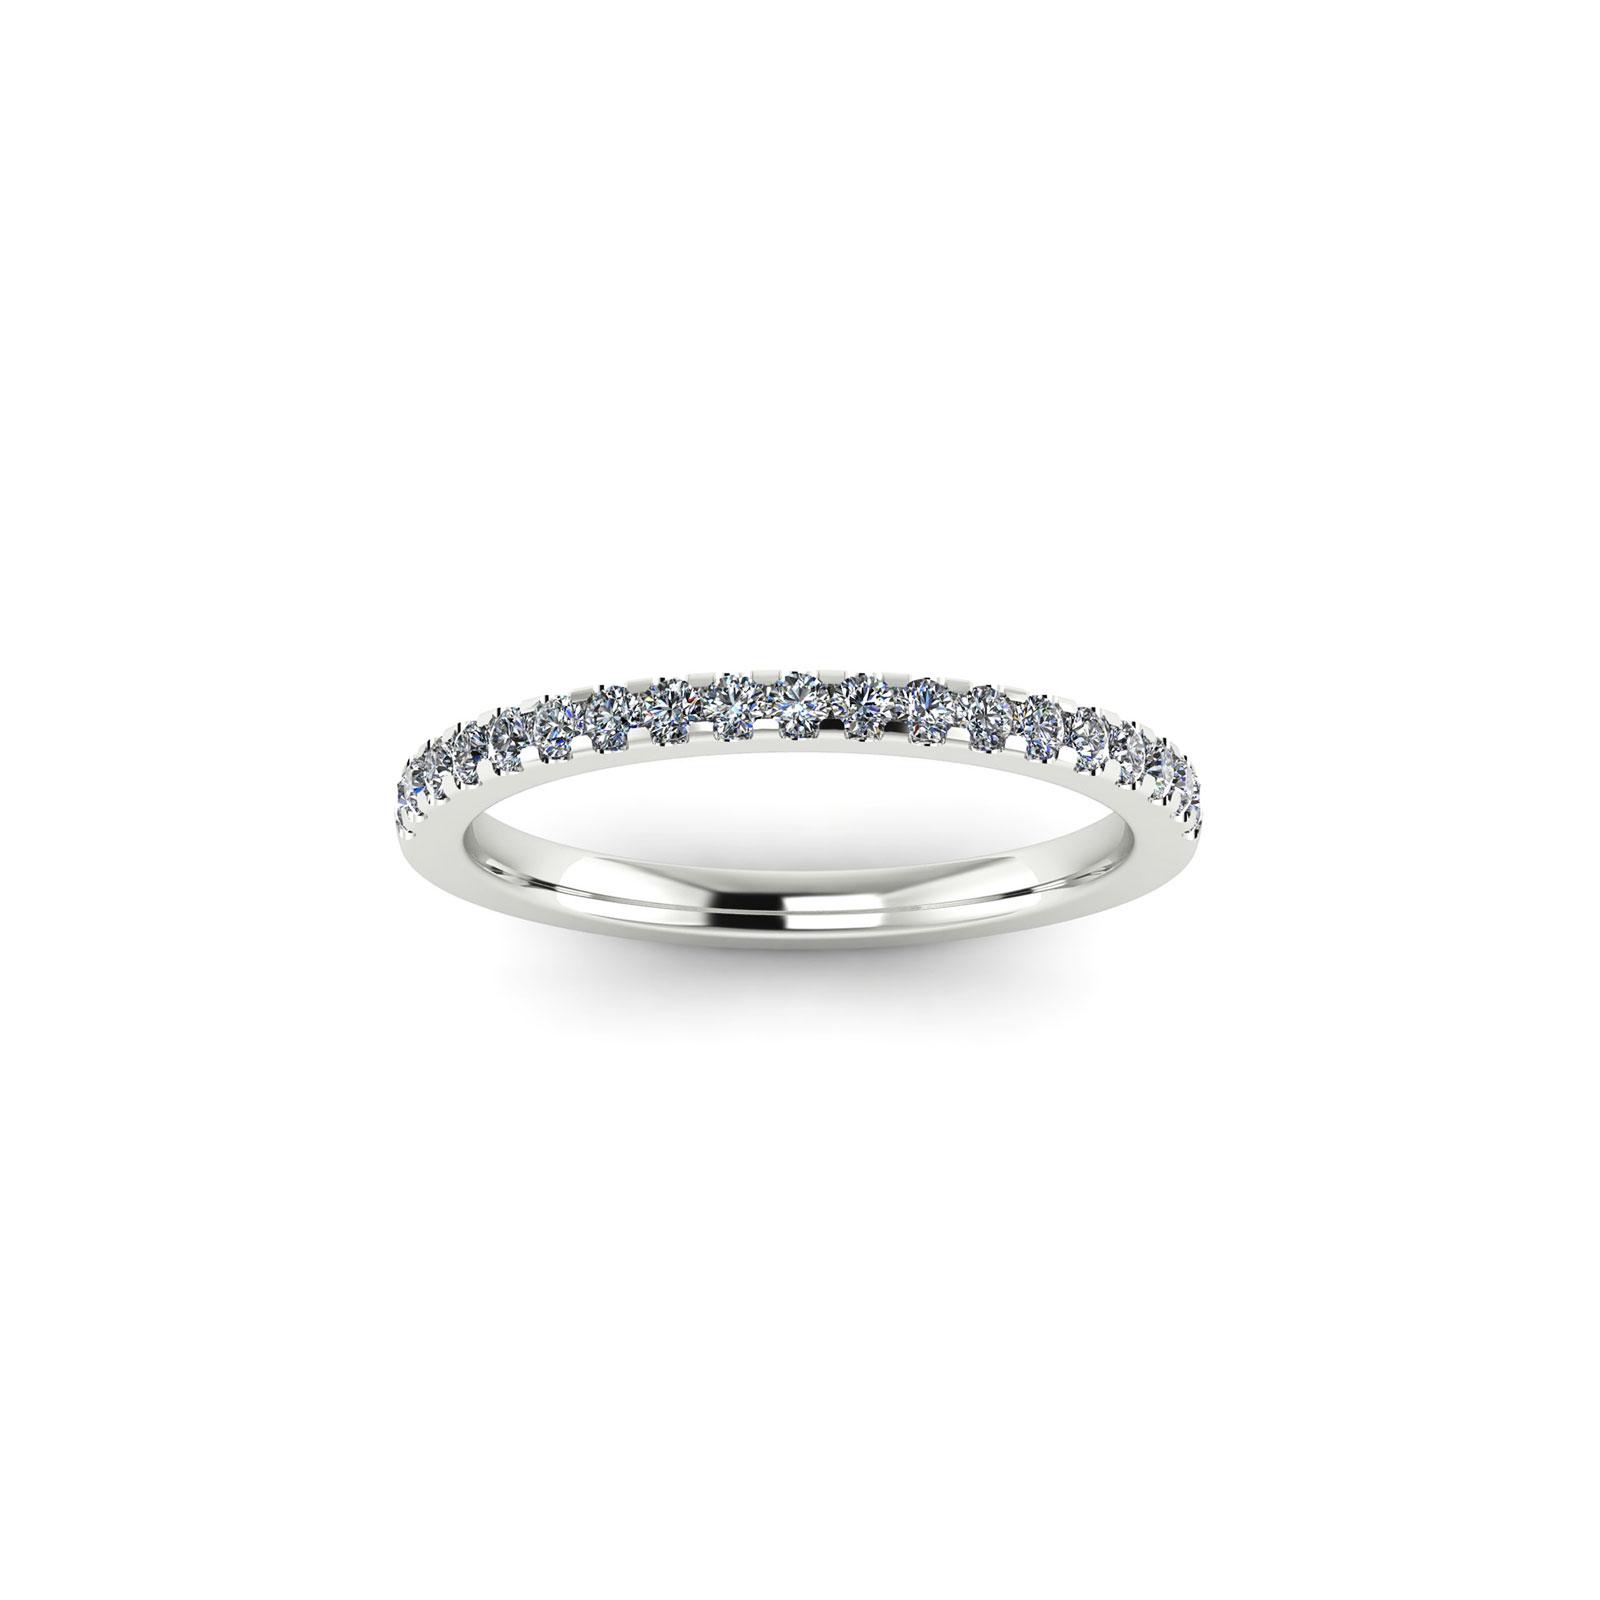 Half Eternity Wedding Band 1.7mm (Top View) - Draco Diamonds